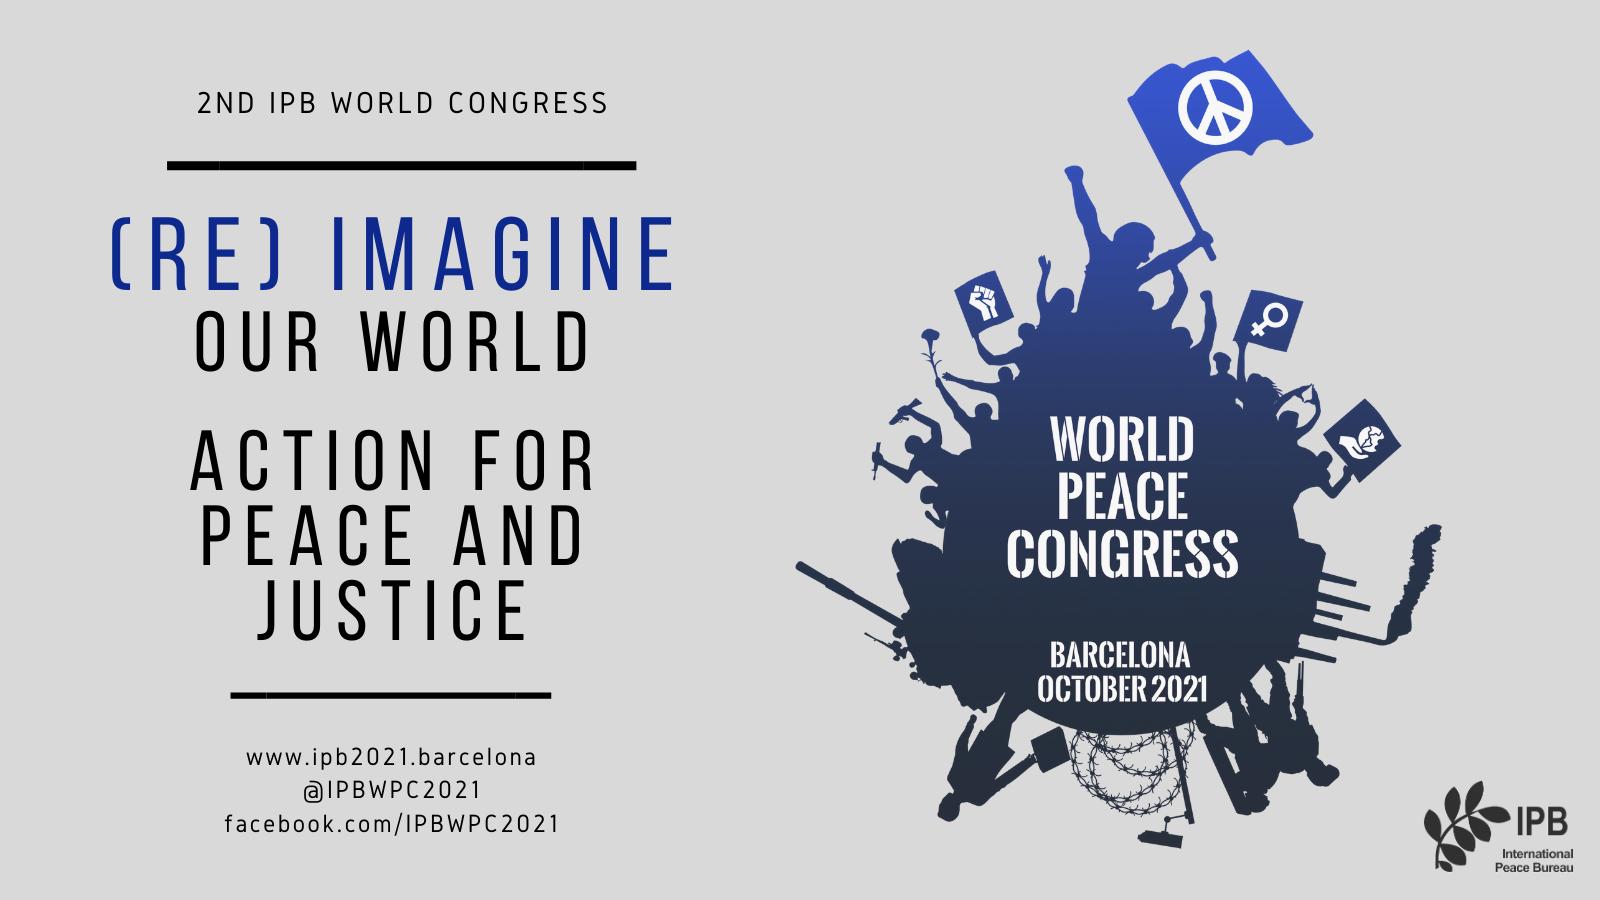 IPB World Peace Congress: ICBUW Veranstaltung